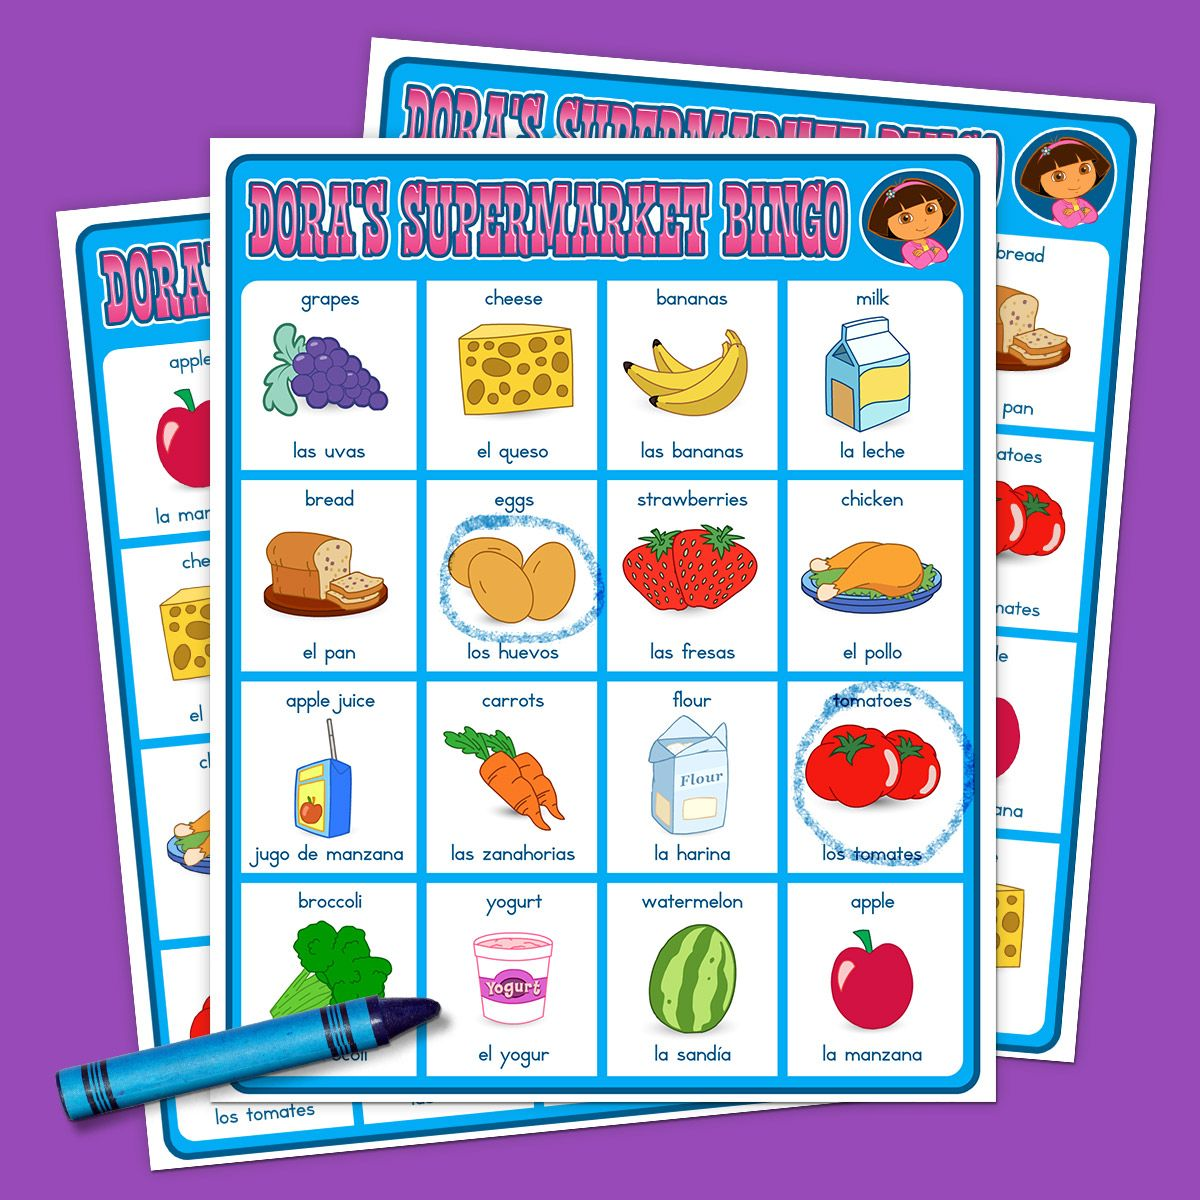 Top 10 Dora The Explorer Printables Of All Time Explorers Activities Supermarket Games Supermarket [ 1200 x 1200 Pixel ]